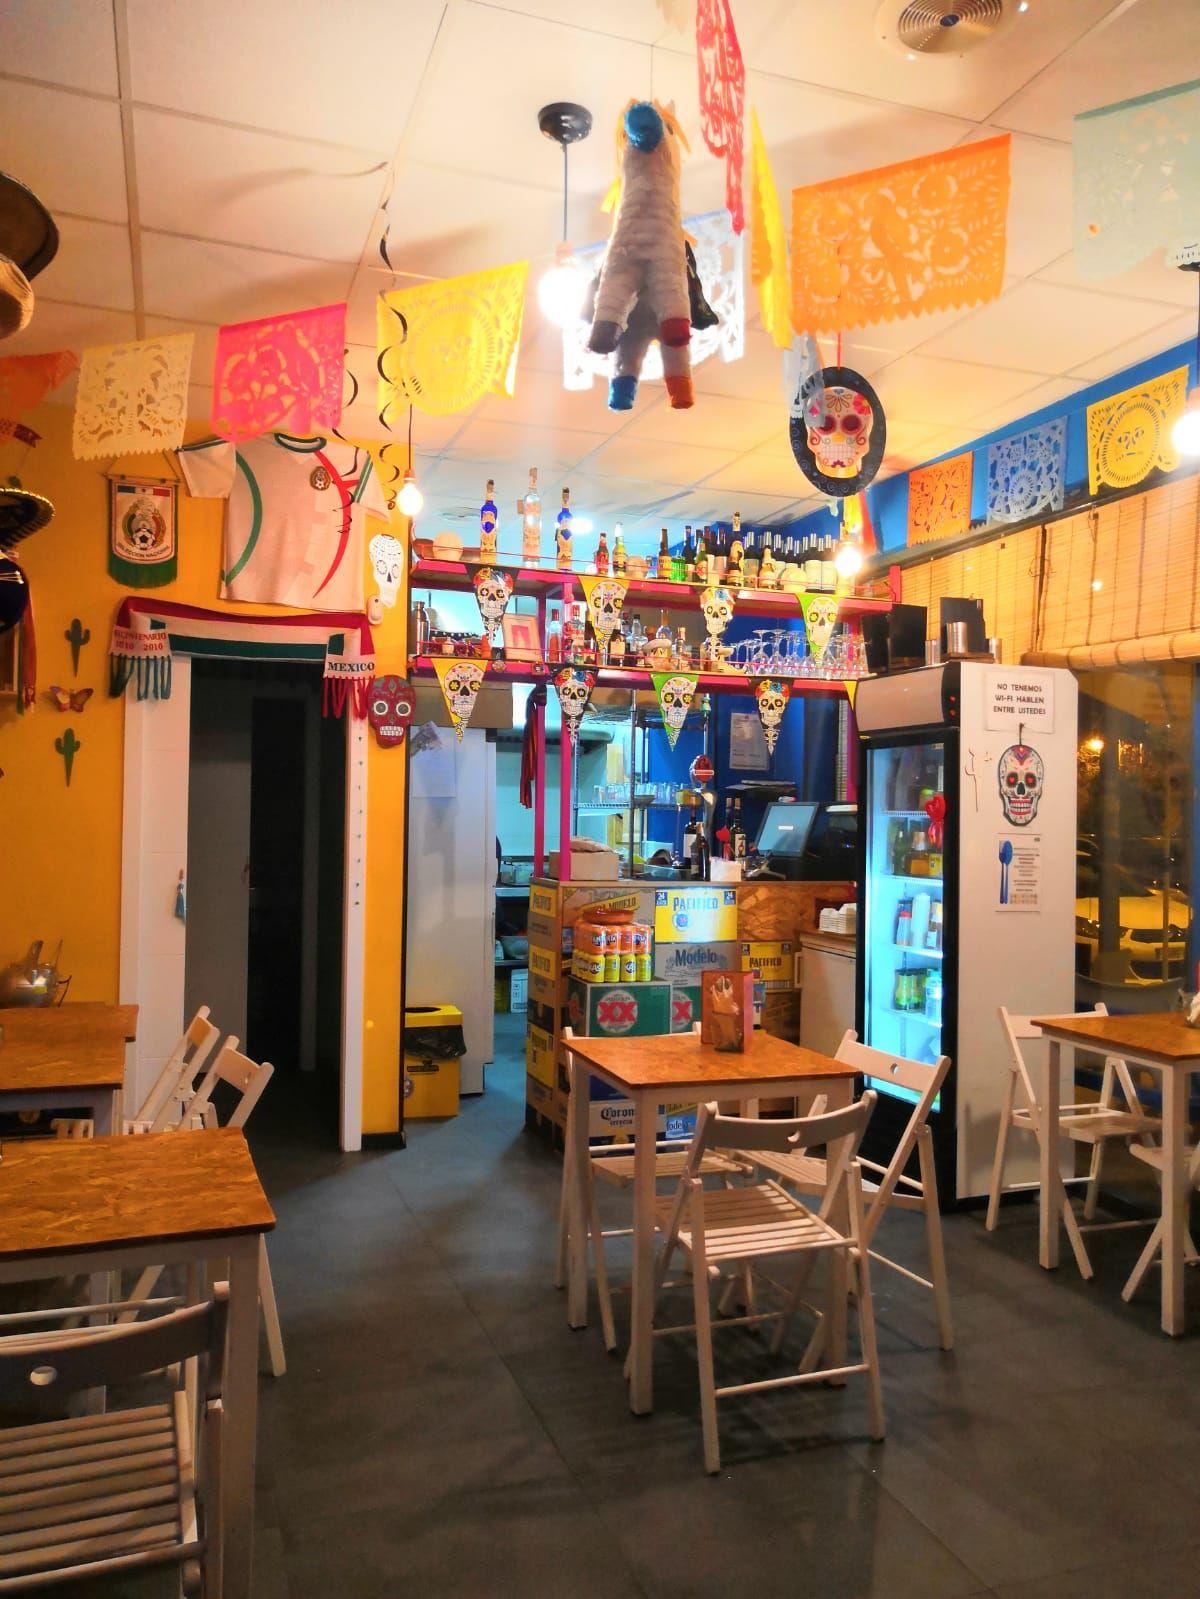 Foto 36 de Restaurante mexicano en  | Cantina La Catrina